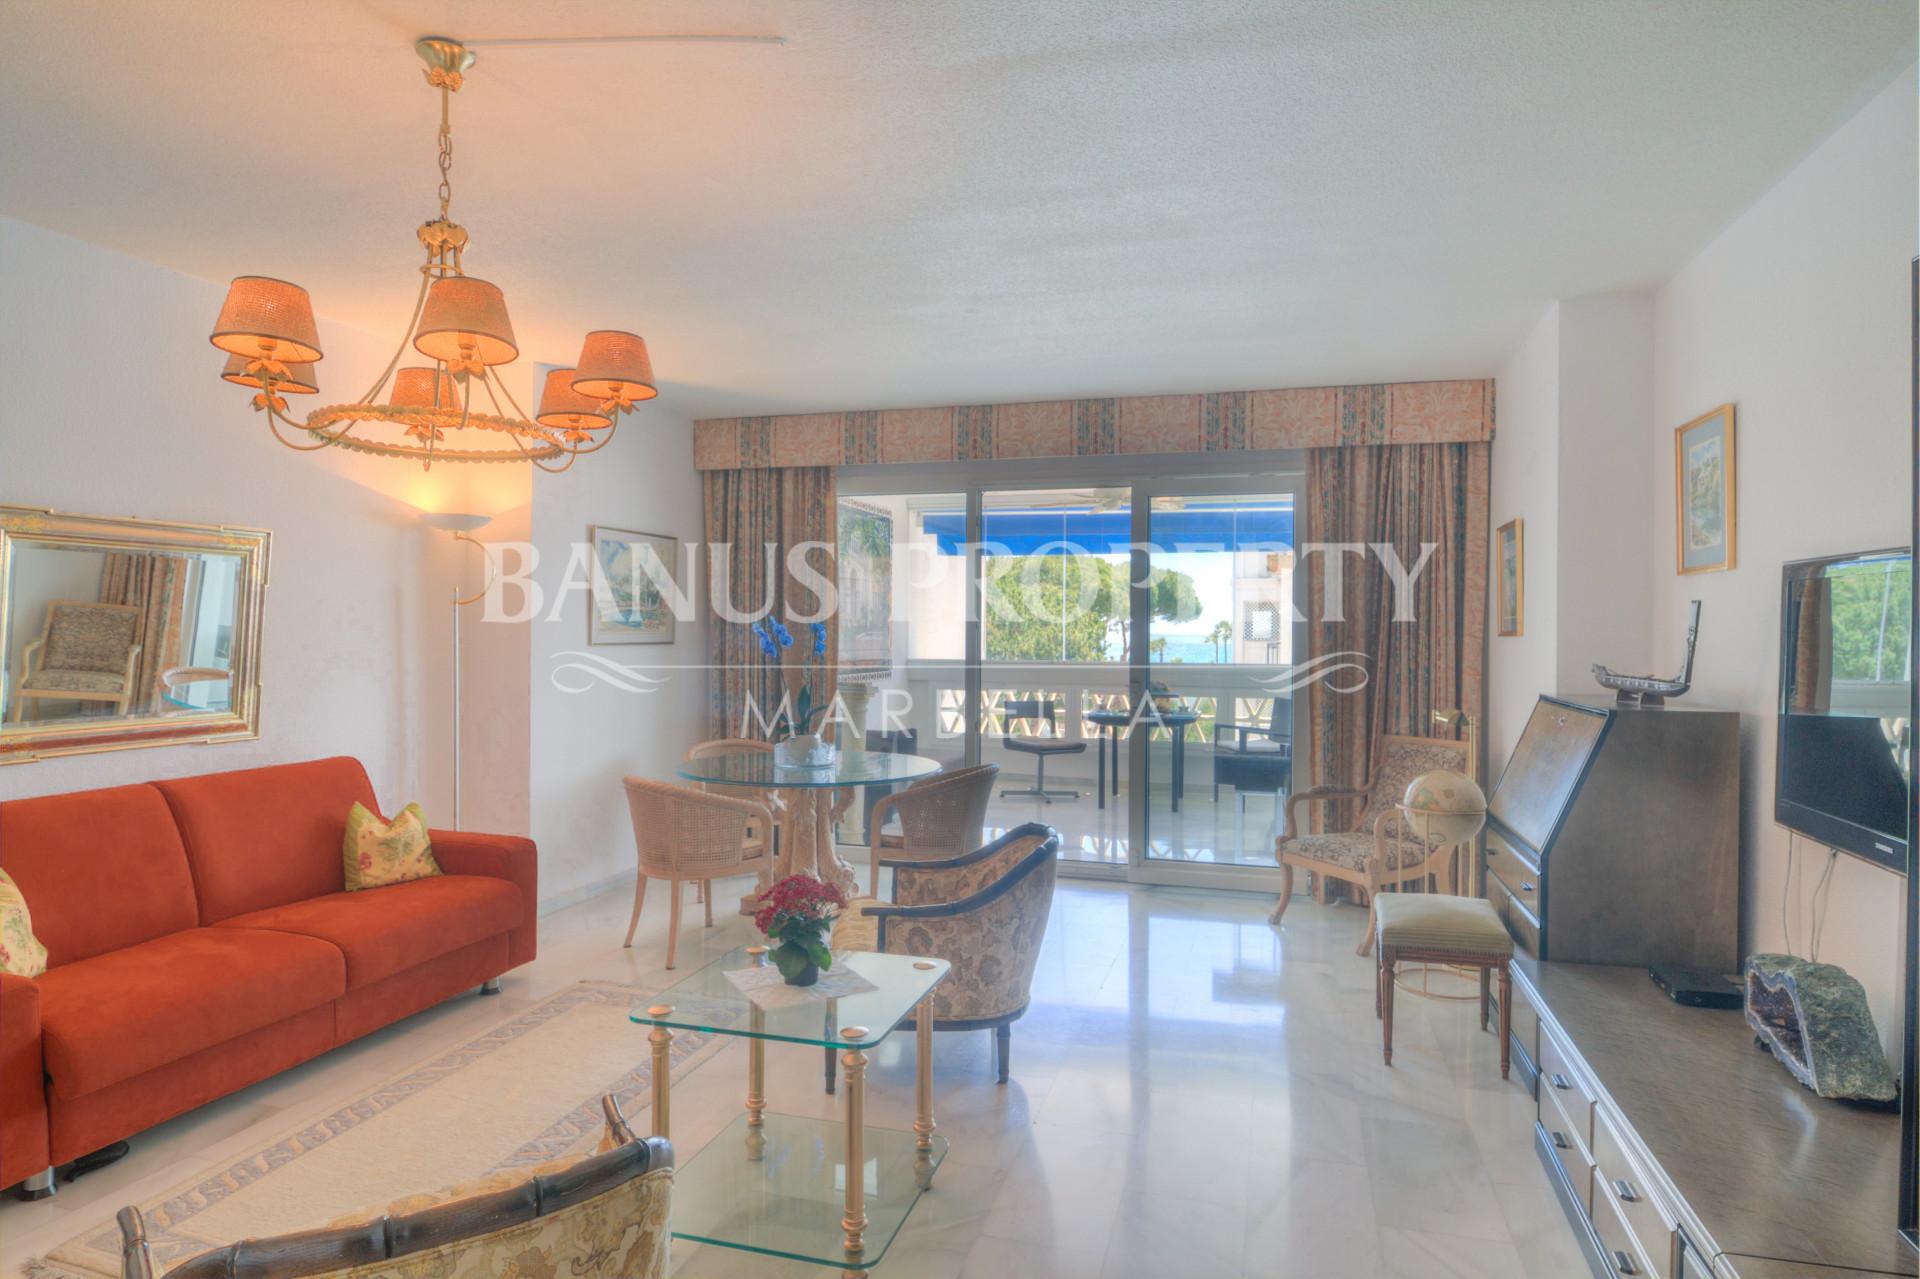 1-bedroom apartment apartment with sea views for rent in Playas del Duque, Puerto Banus